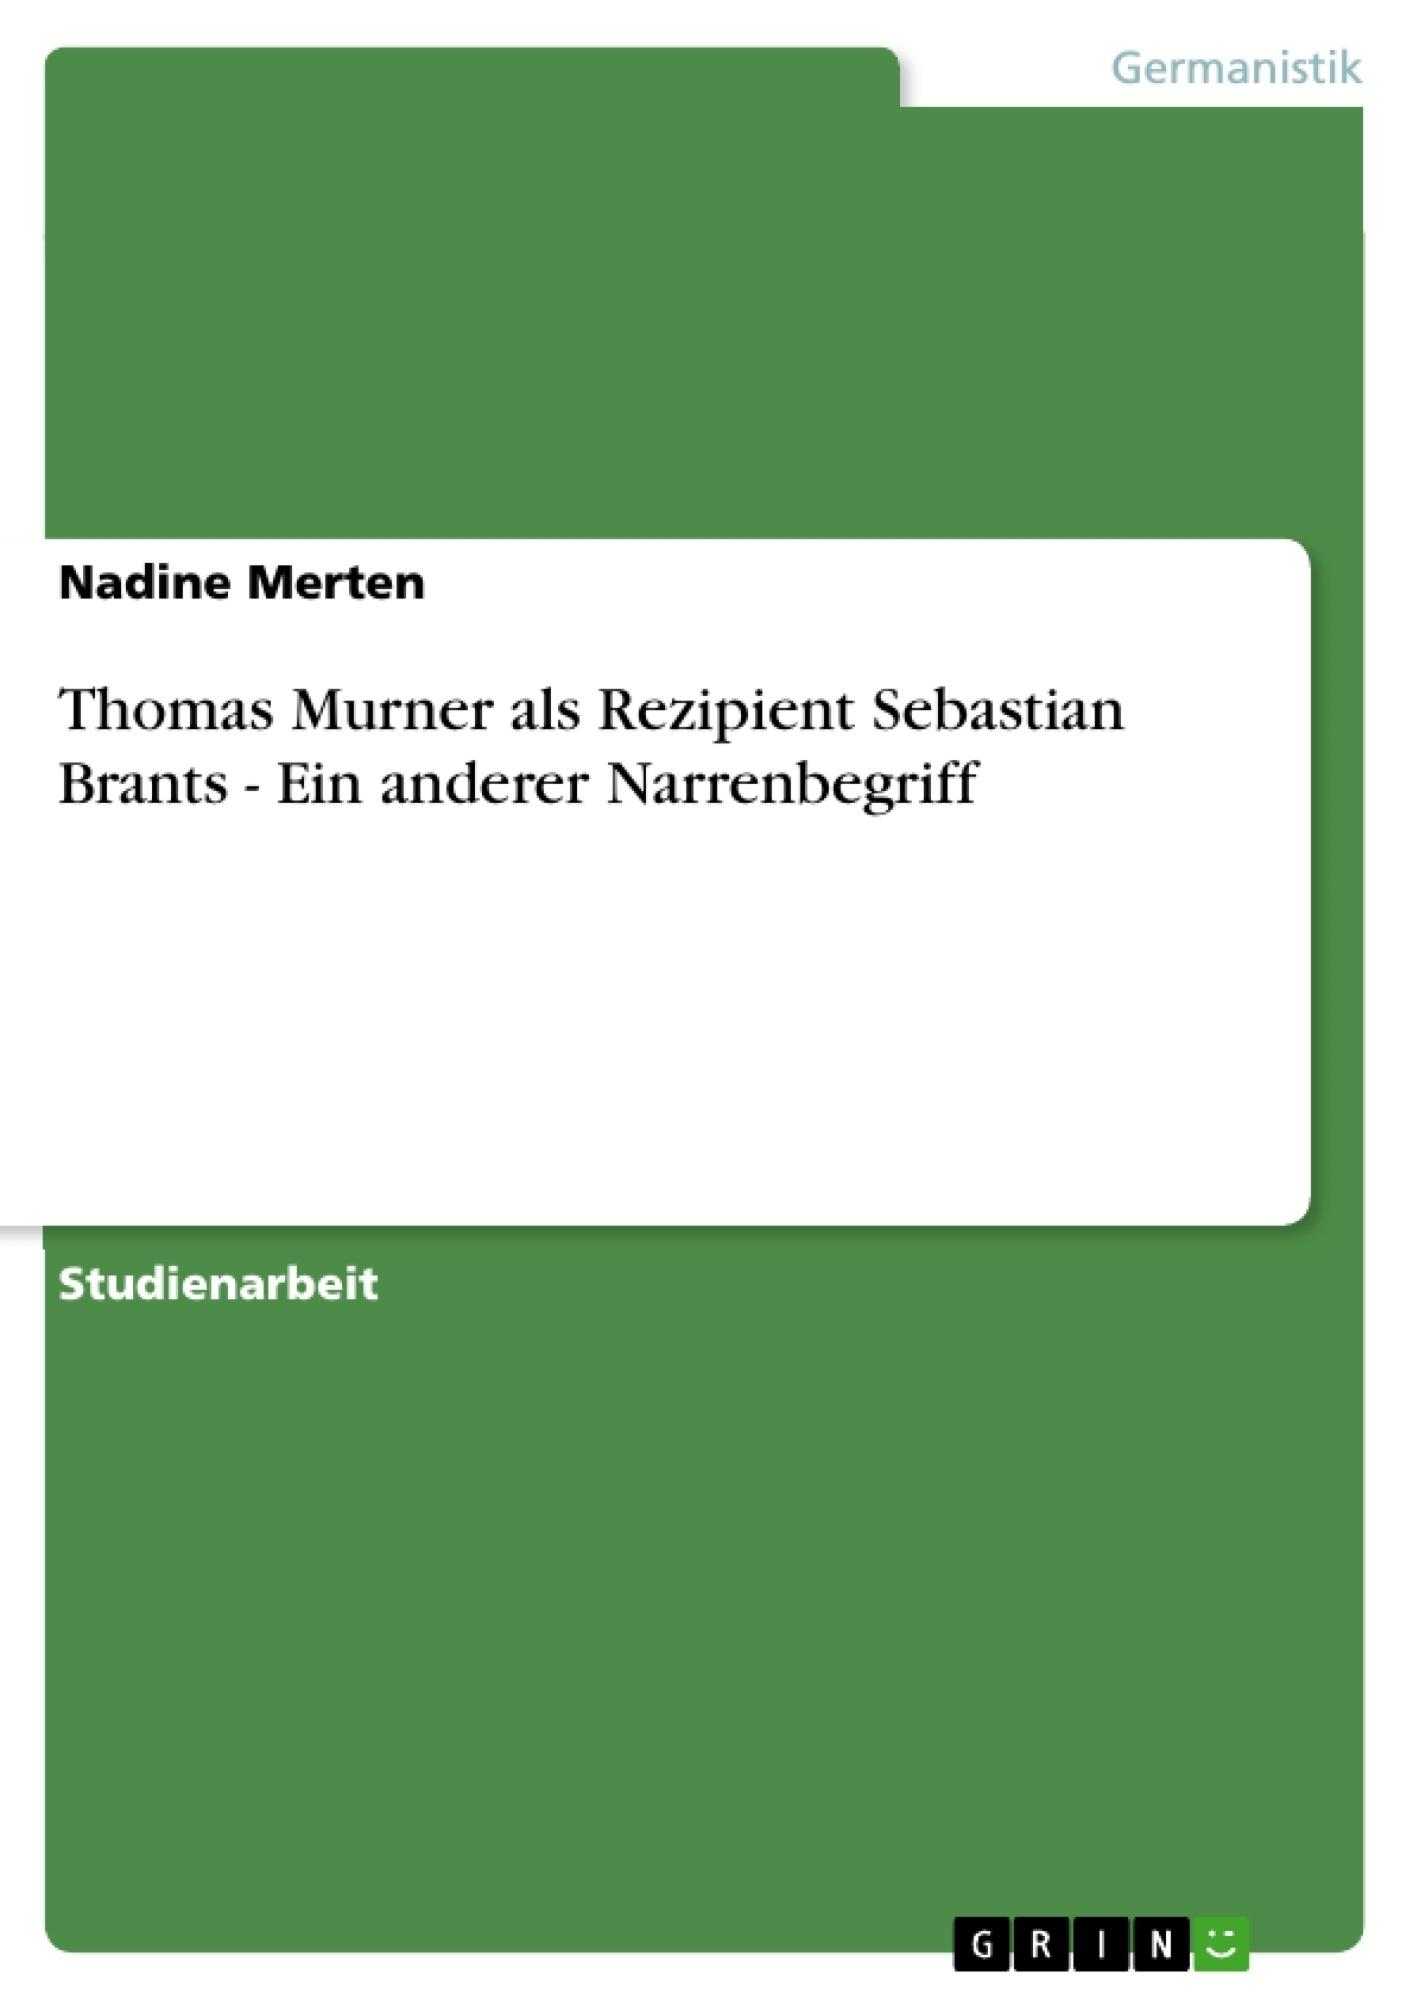 Titel: Thomas Murner als Rezipient Sebastian Brants  -  Ein anderer Narrenbegriff